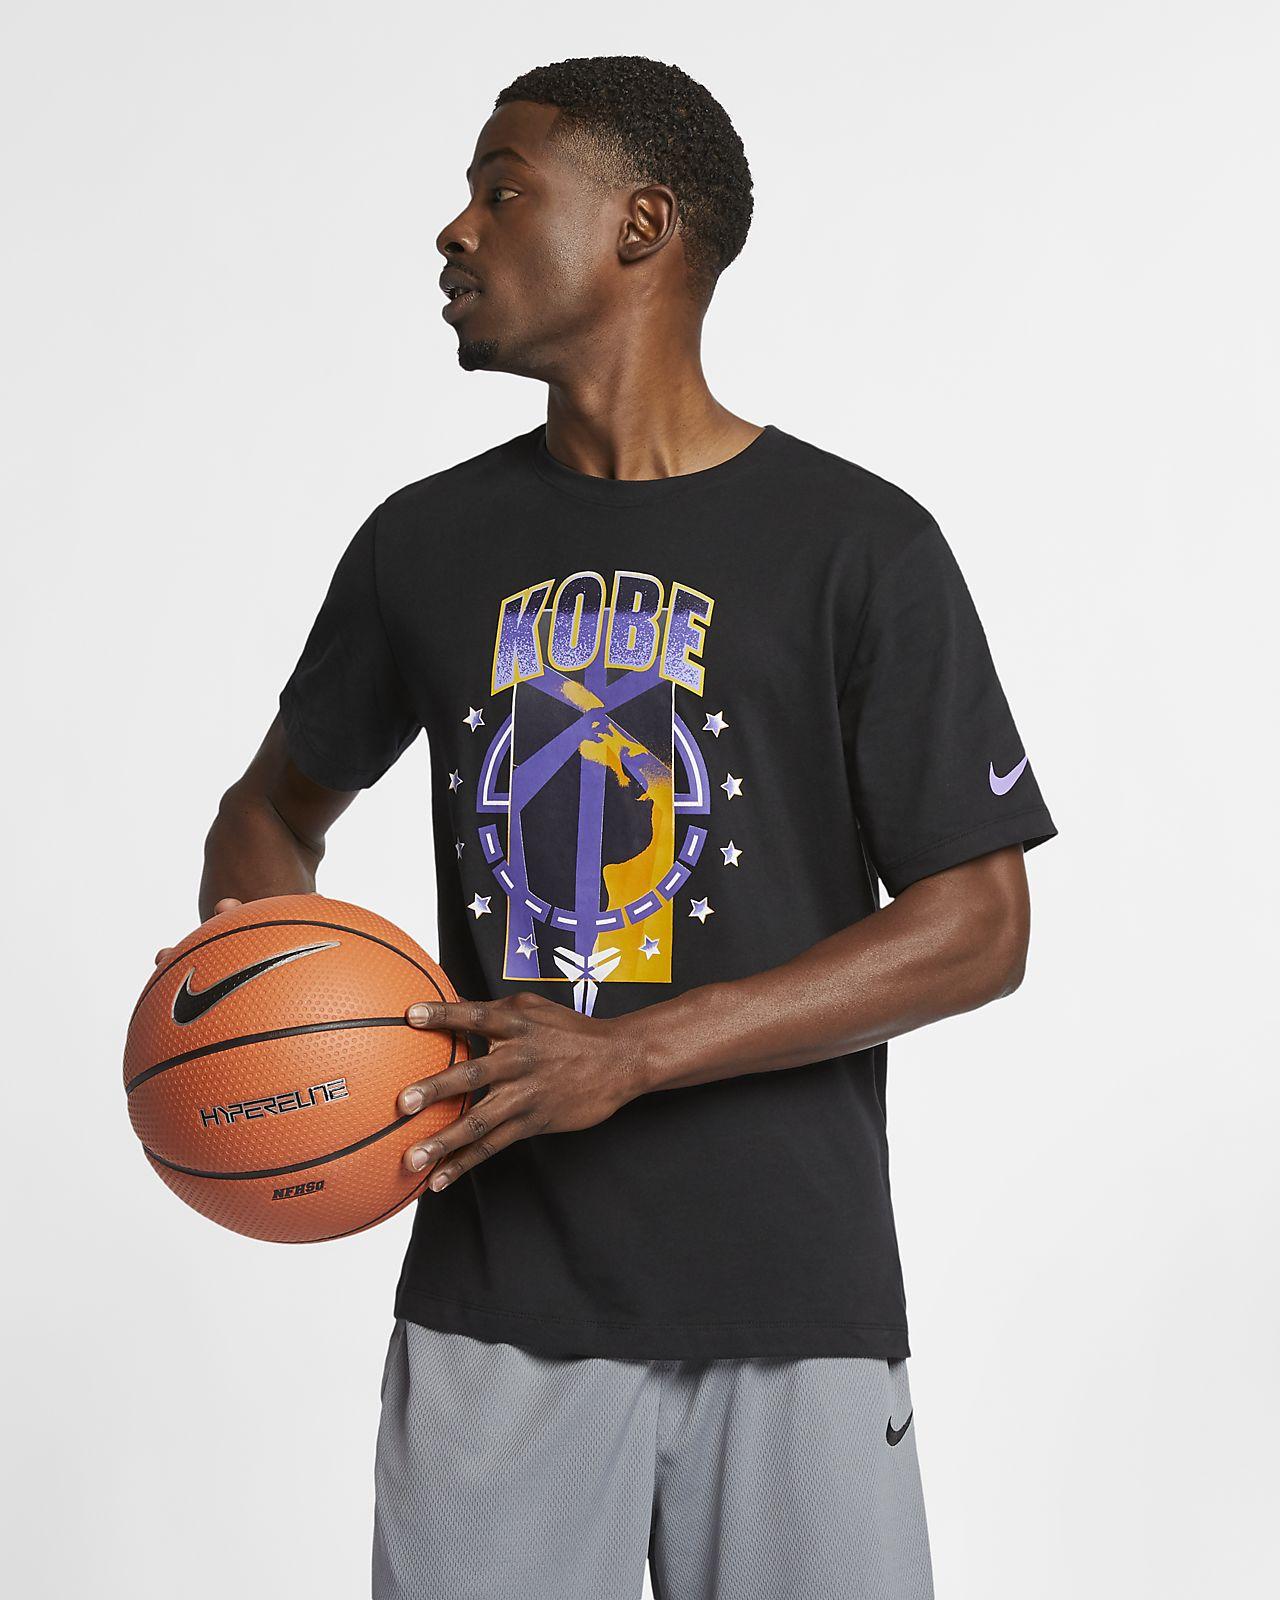 2eed45d0c50f Nike Dri-FIT Kobe Men s T-Shirt. Nike.com CA